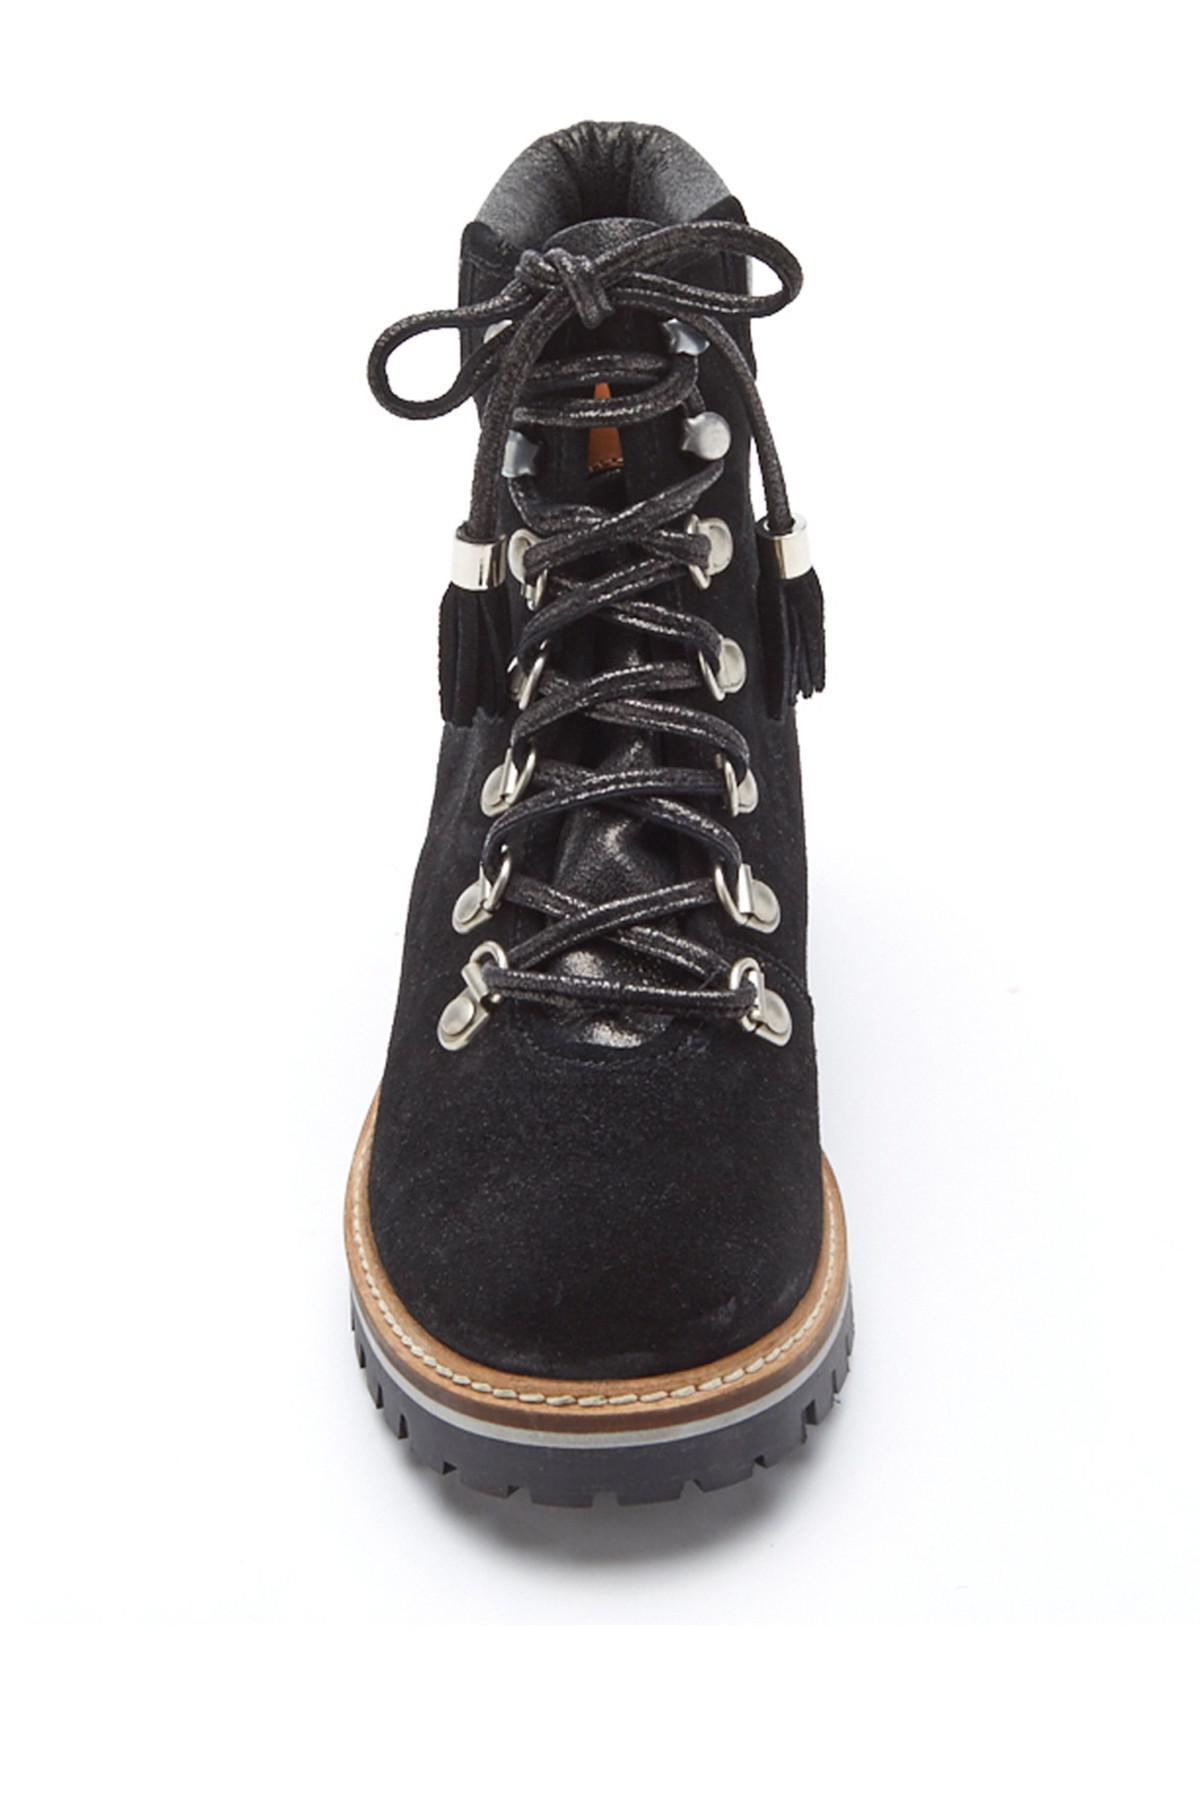 Matisse Rugged Suede Hiker Boot In Black Lyst